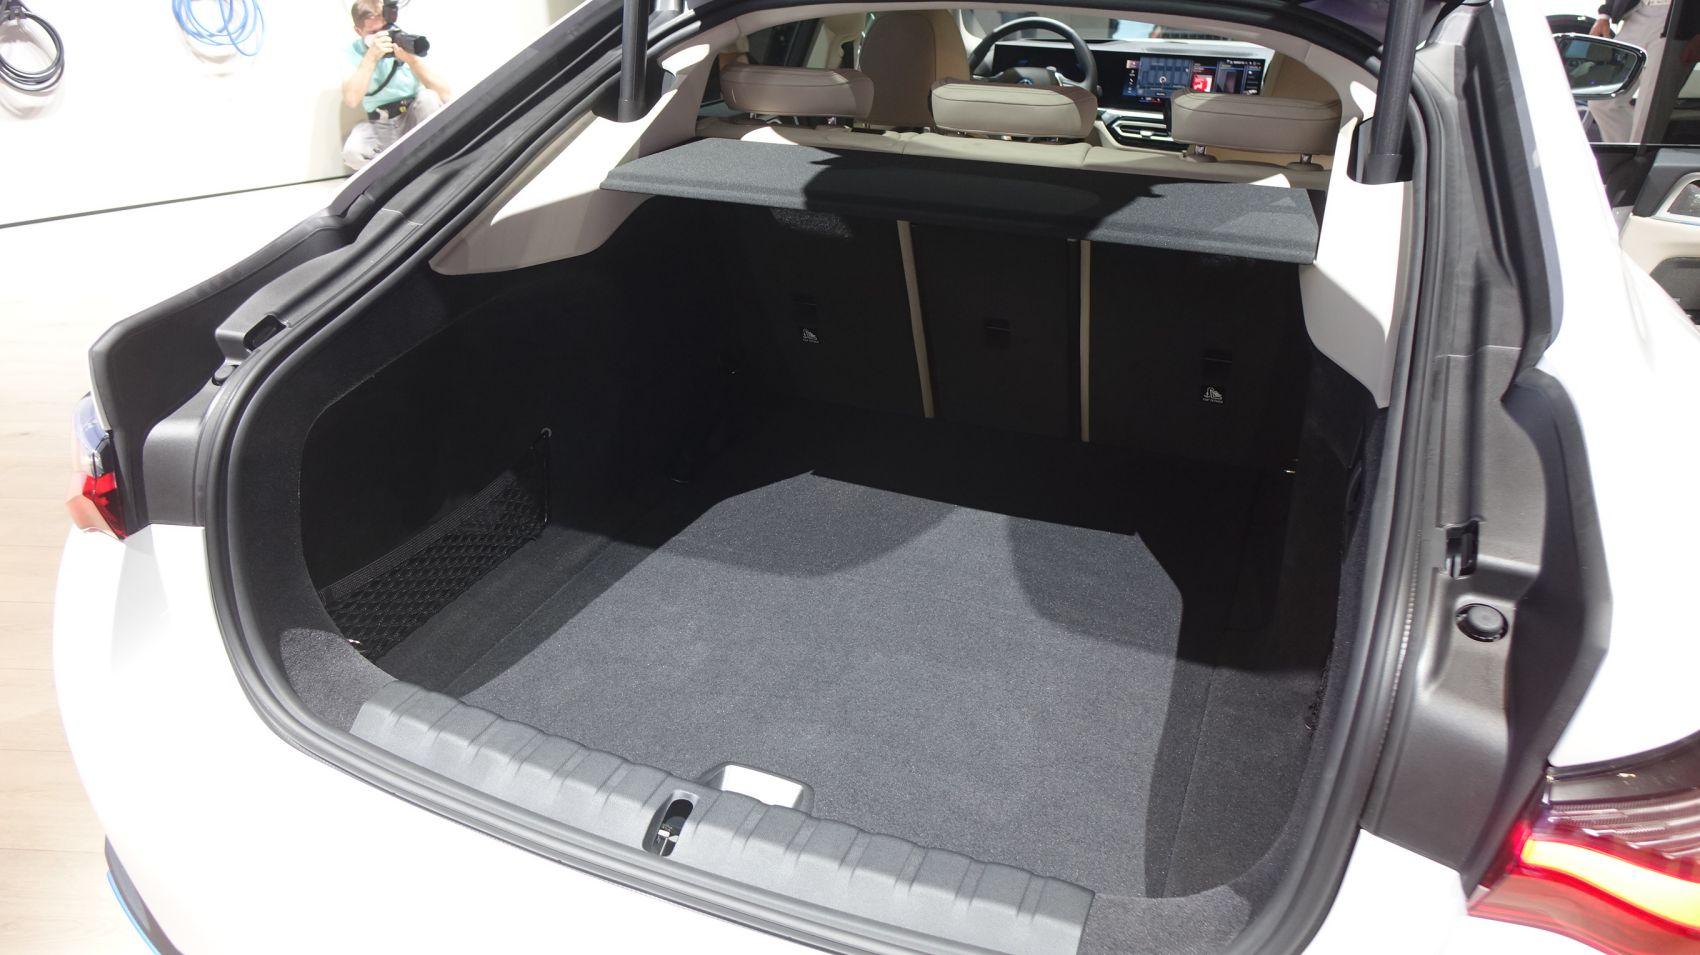 BMW i4 Kofferraum 470 Liter